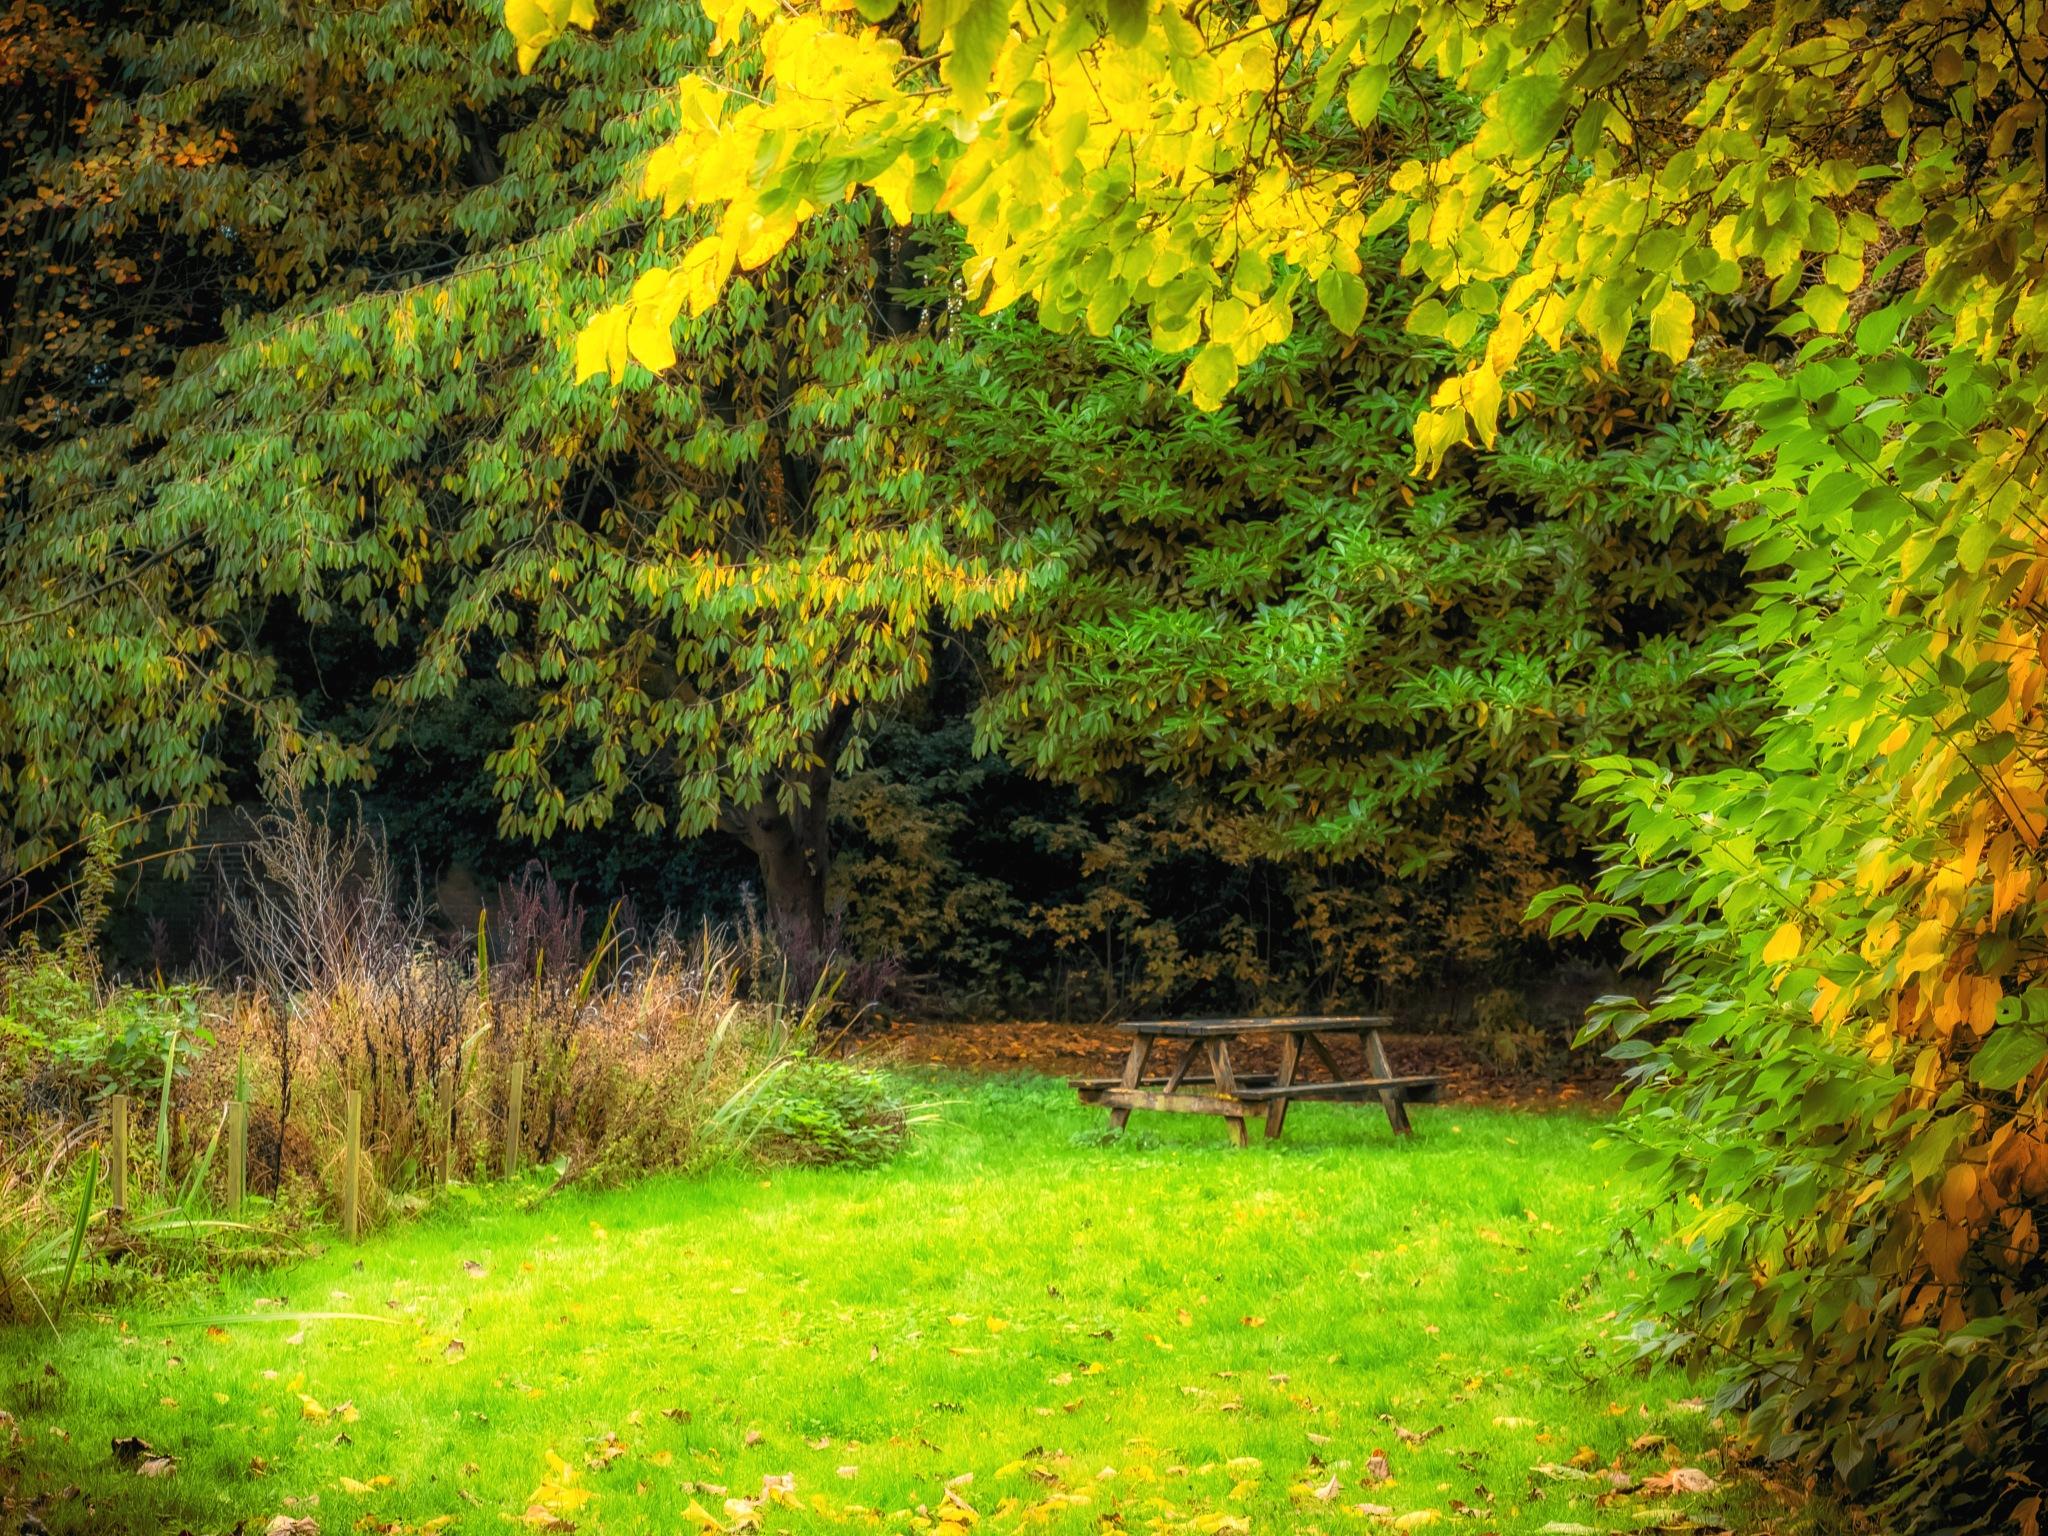 Splash of yellow 2 by Sarah Walters